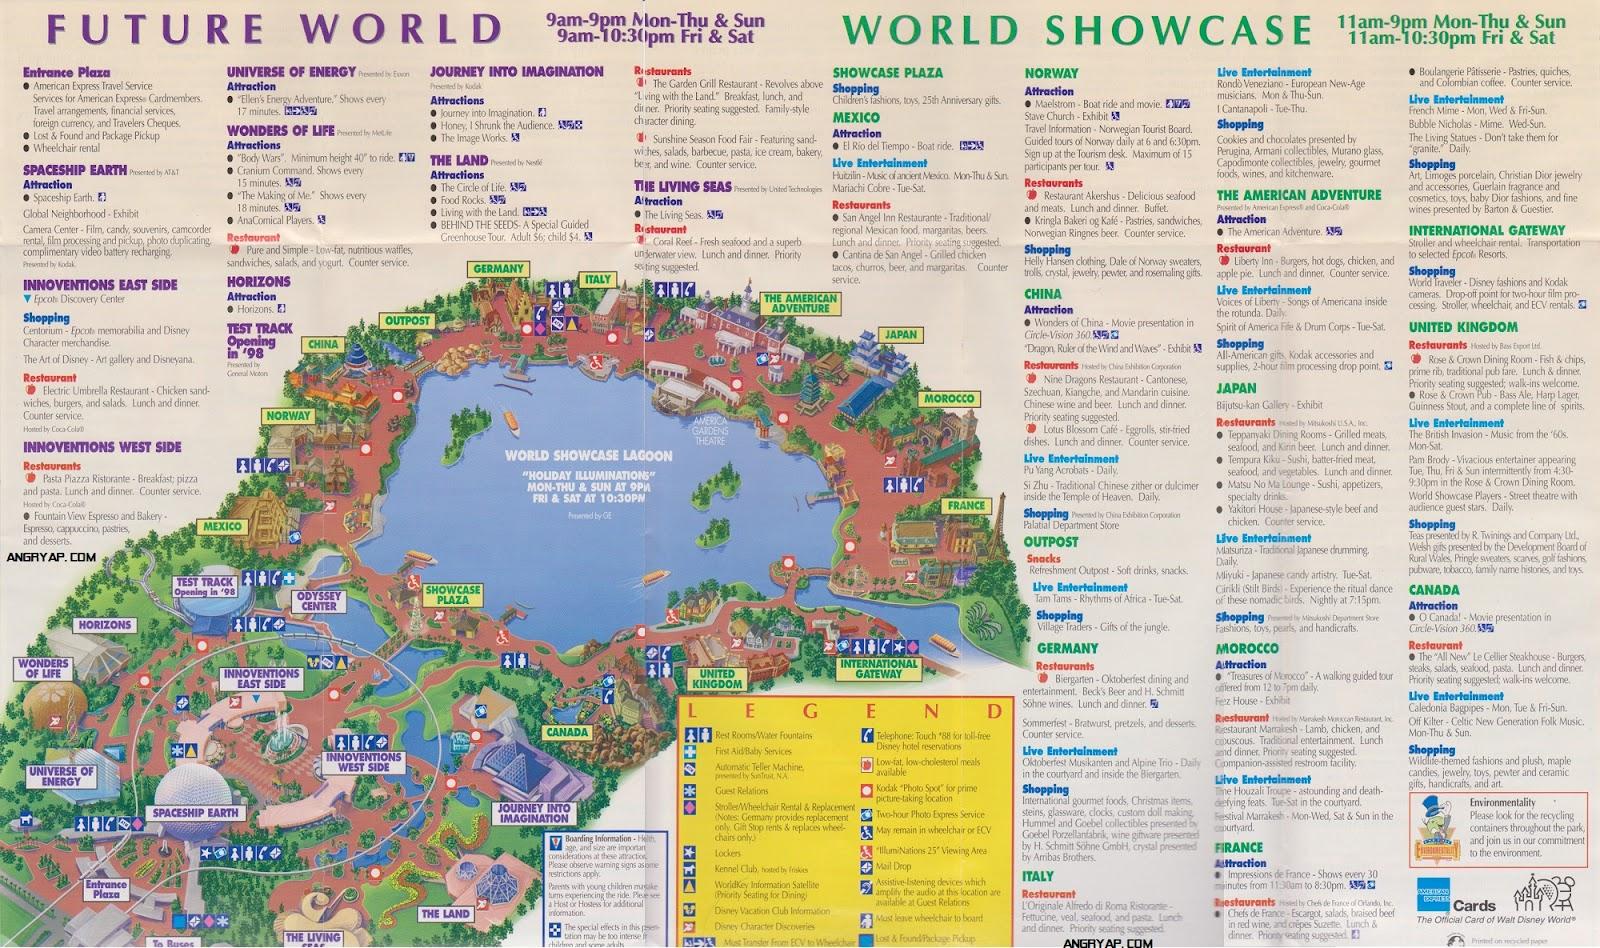 Angry AP - Disneyland and Walt Disney World nostalgia: Epcot ... on disney halloween party map, disney dolphin map, disney area map, disney animal kingdom map, orlando map, disney studios map, disney star wars map, downtown disney map, disney water parks map, disney world map, disney pixar map, disney tomorrowland map, disney fantasyland map, disney france map, disney's blizzard beach map, disney pirates of the caribbean map, disney amusement park map, disney boardwalk map, disney magic kingdom, disney palm golf course map,